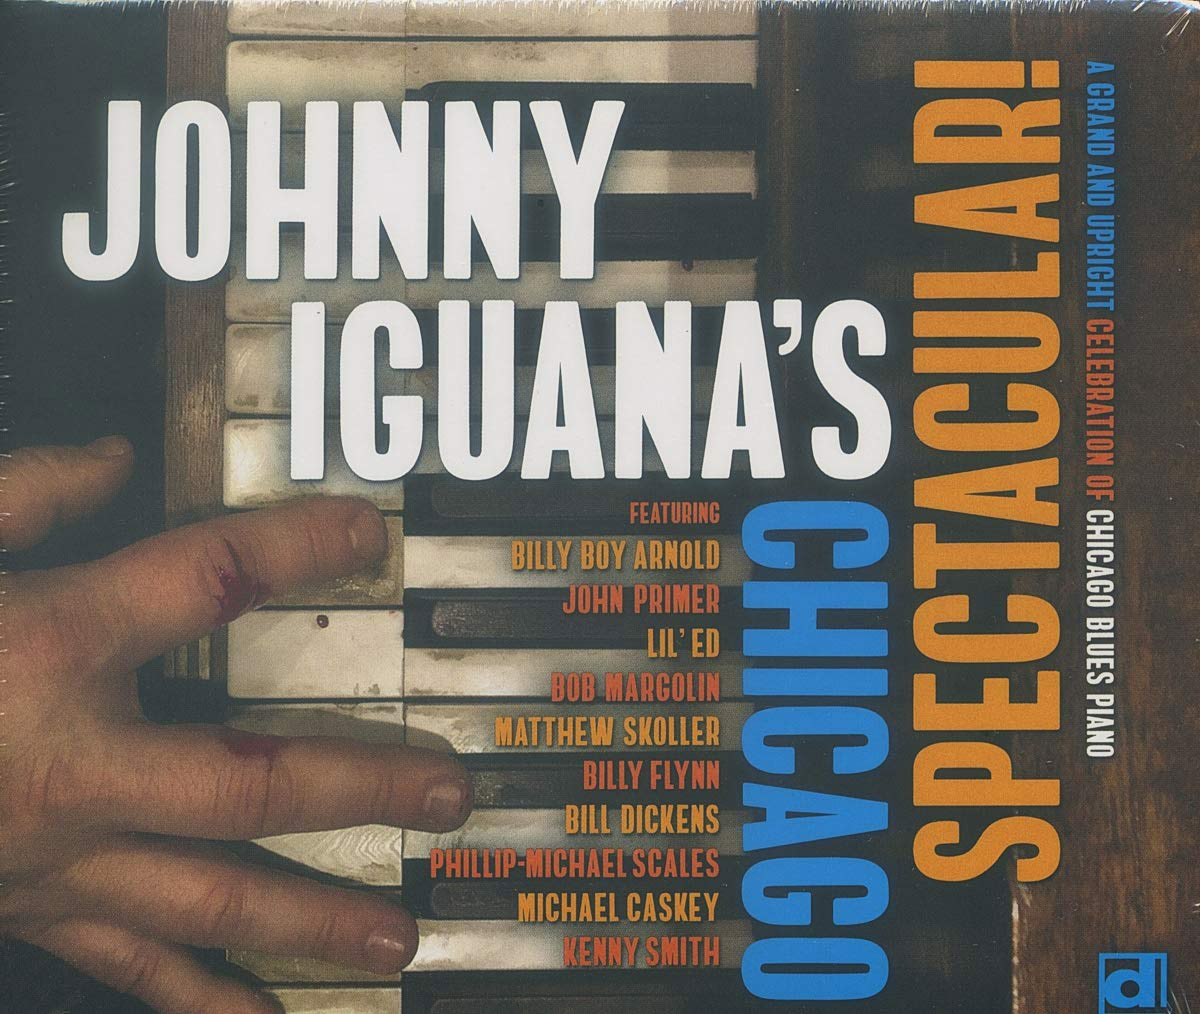 Johnny Iguana